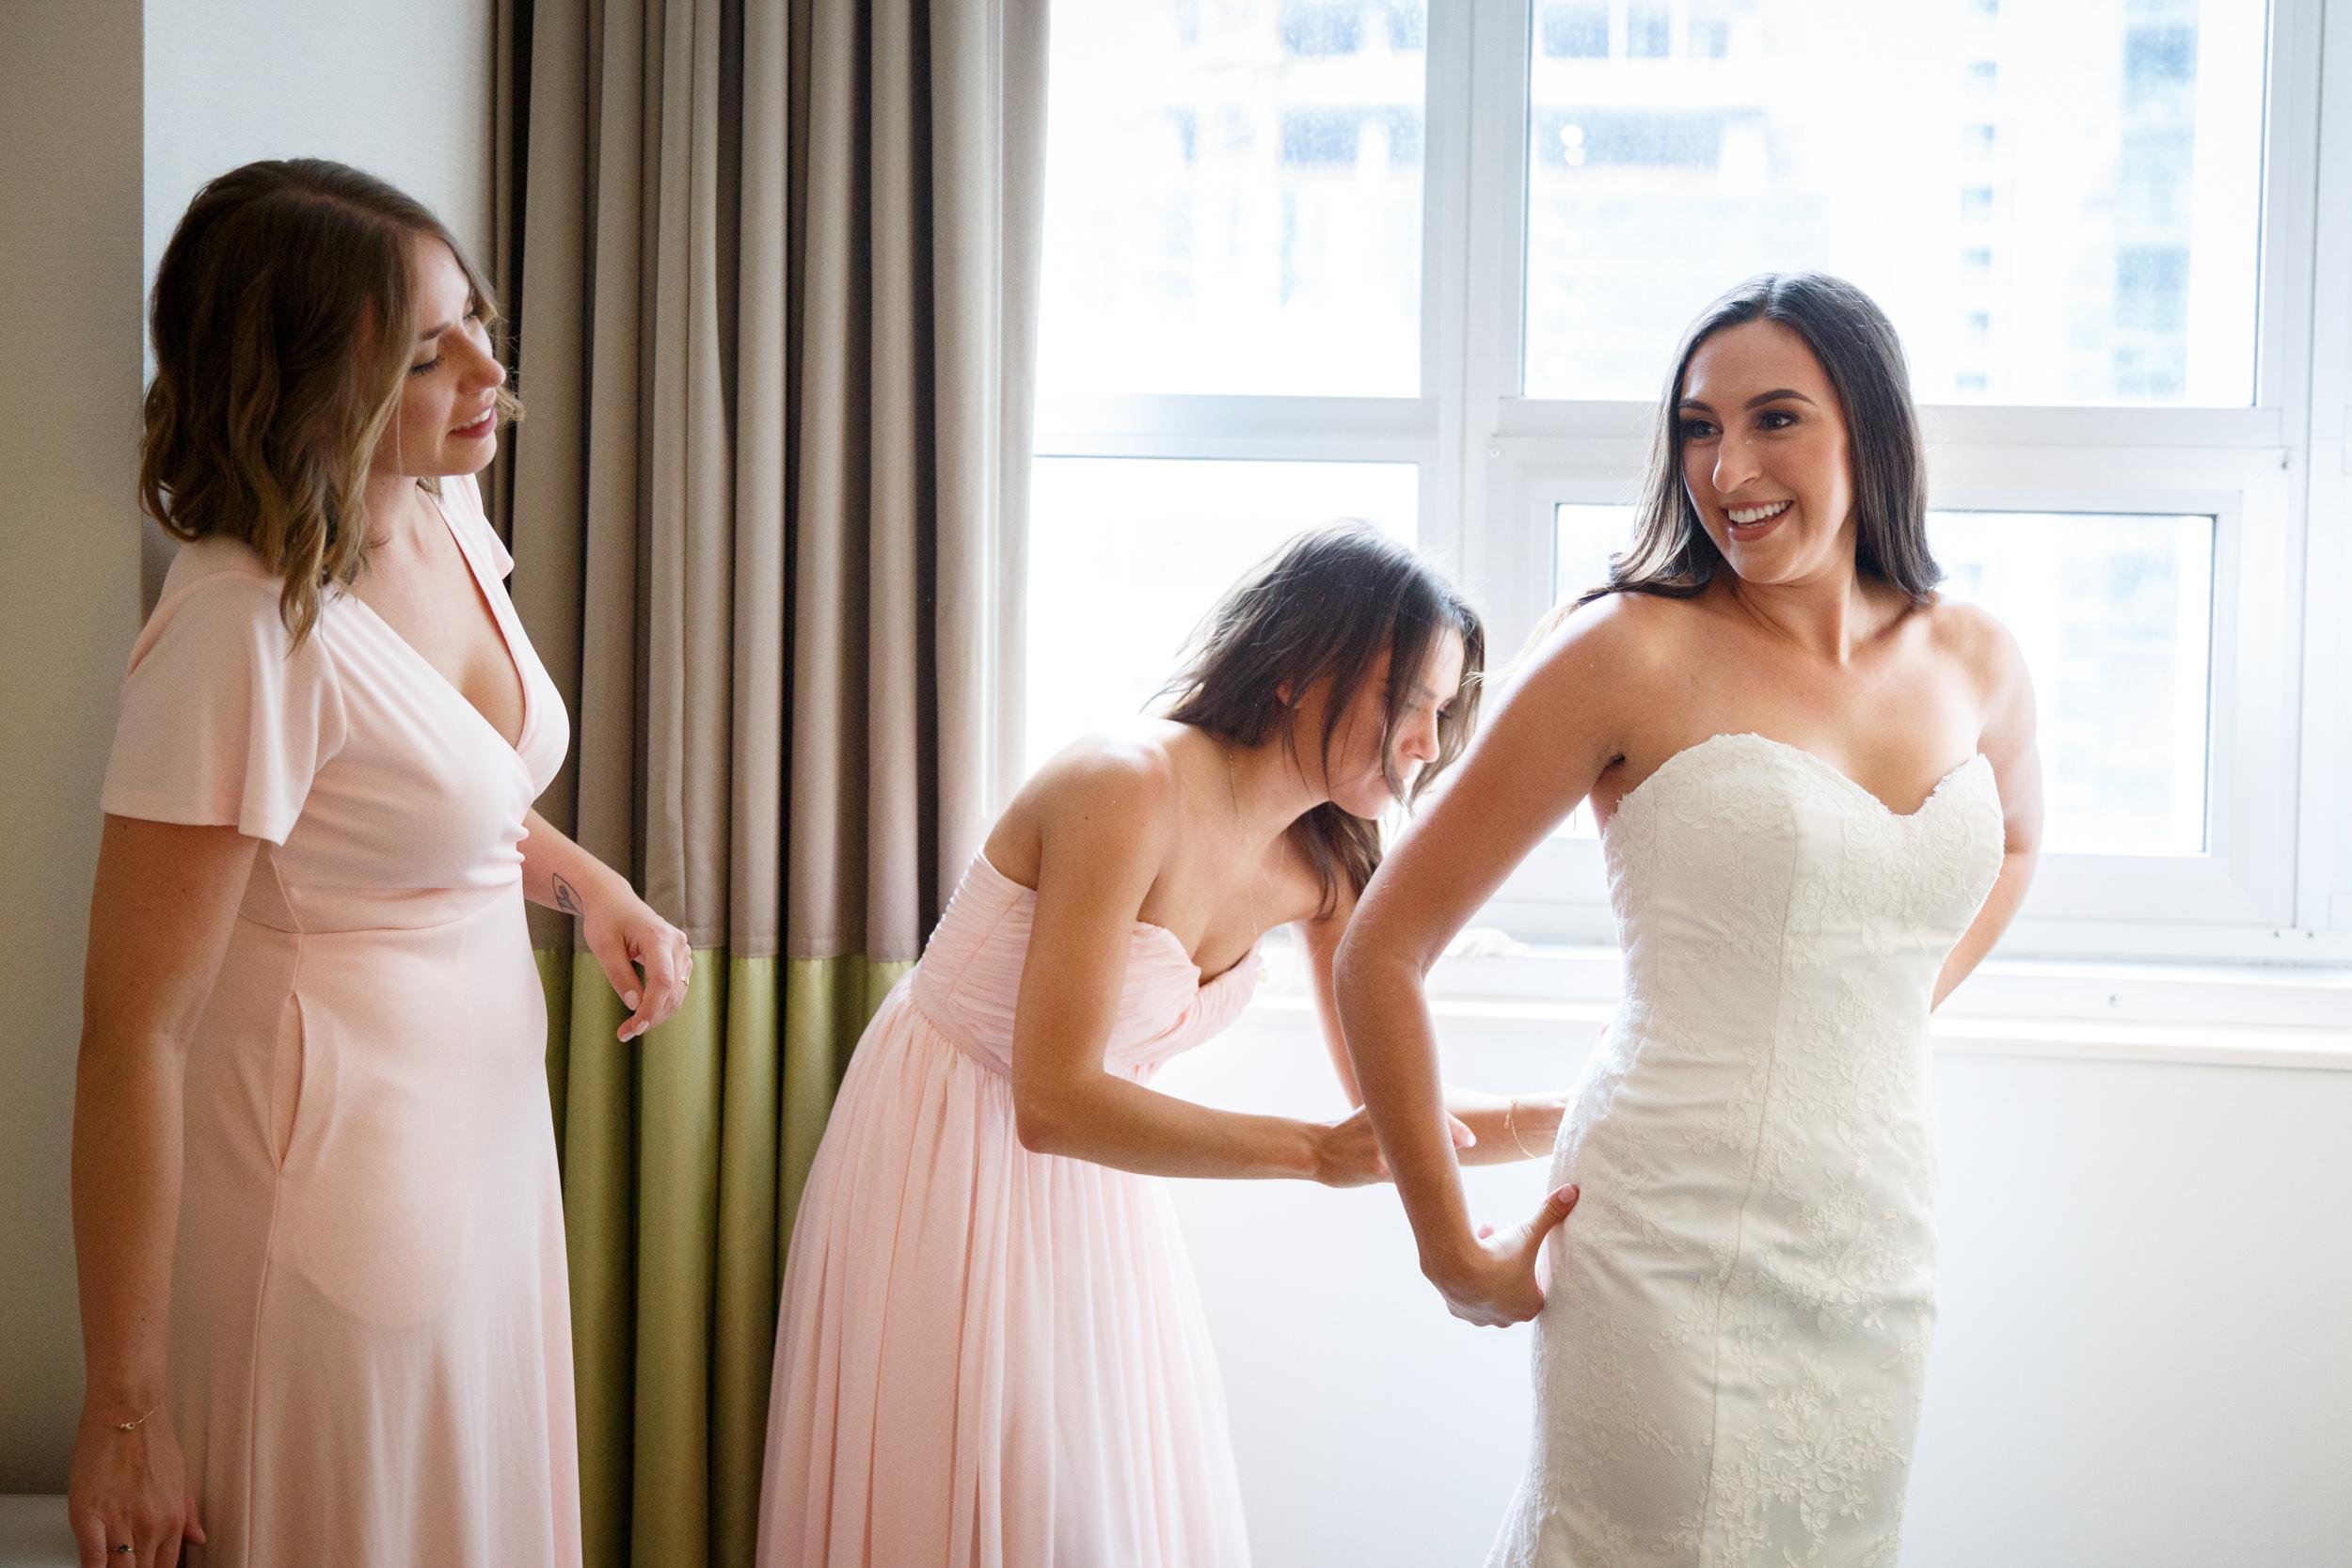 9-09-2016 Flora & Colin wedding photography by Brian Milo-108.jpg